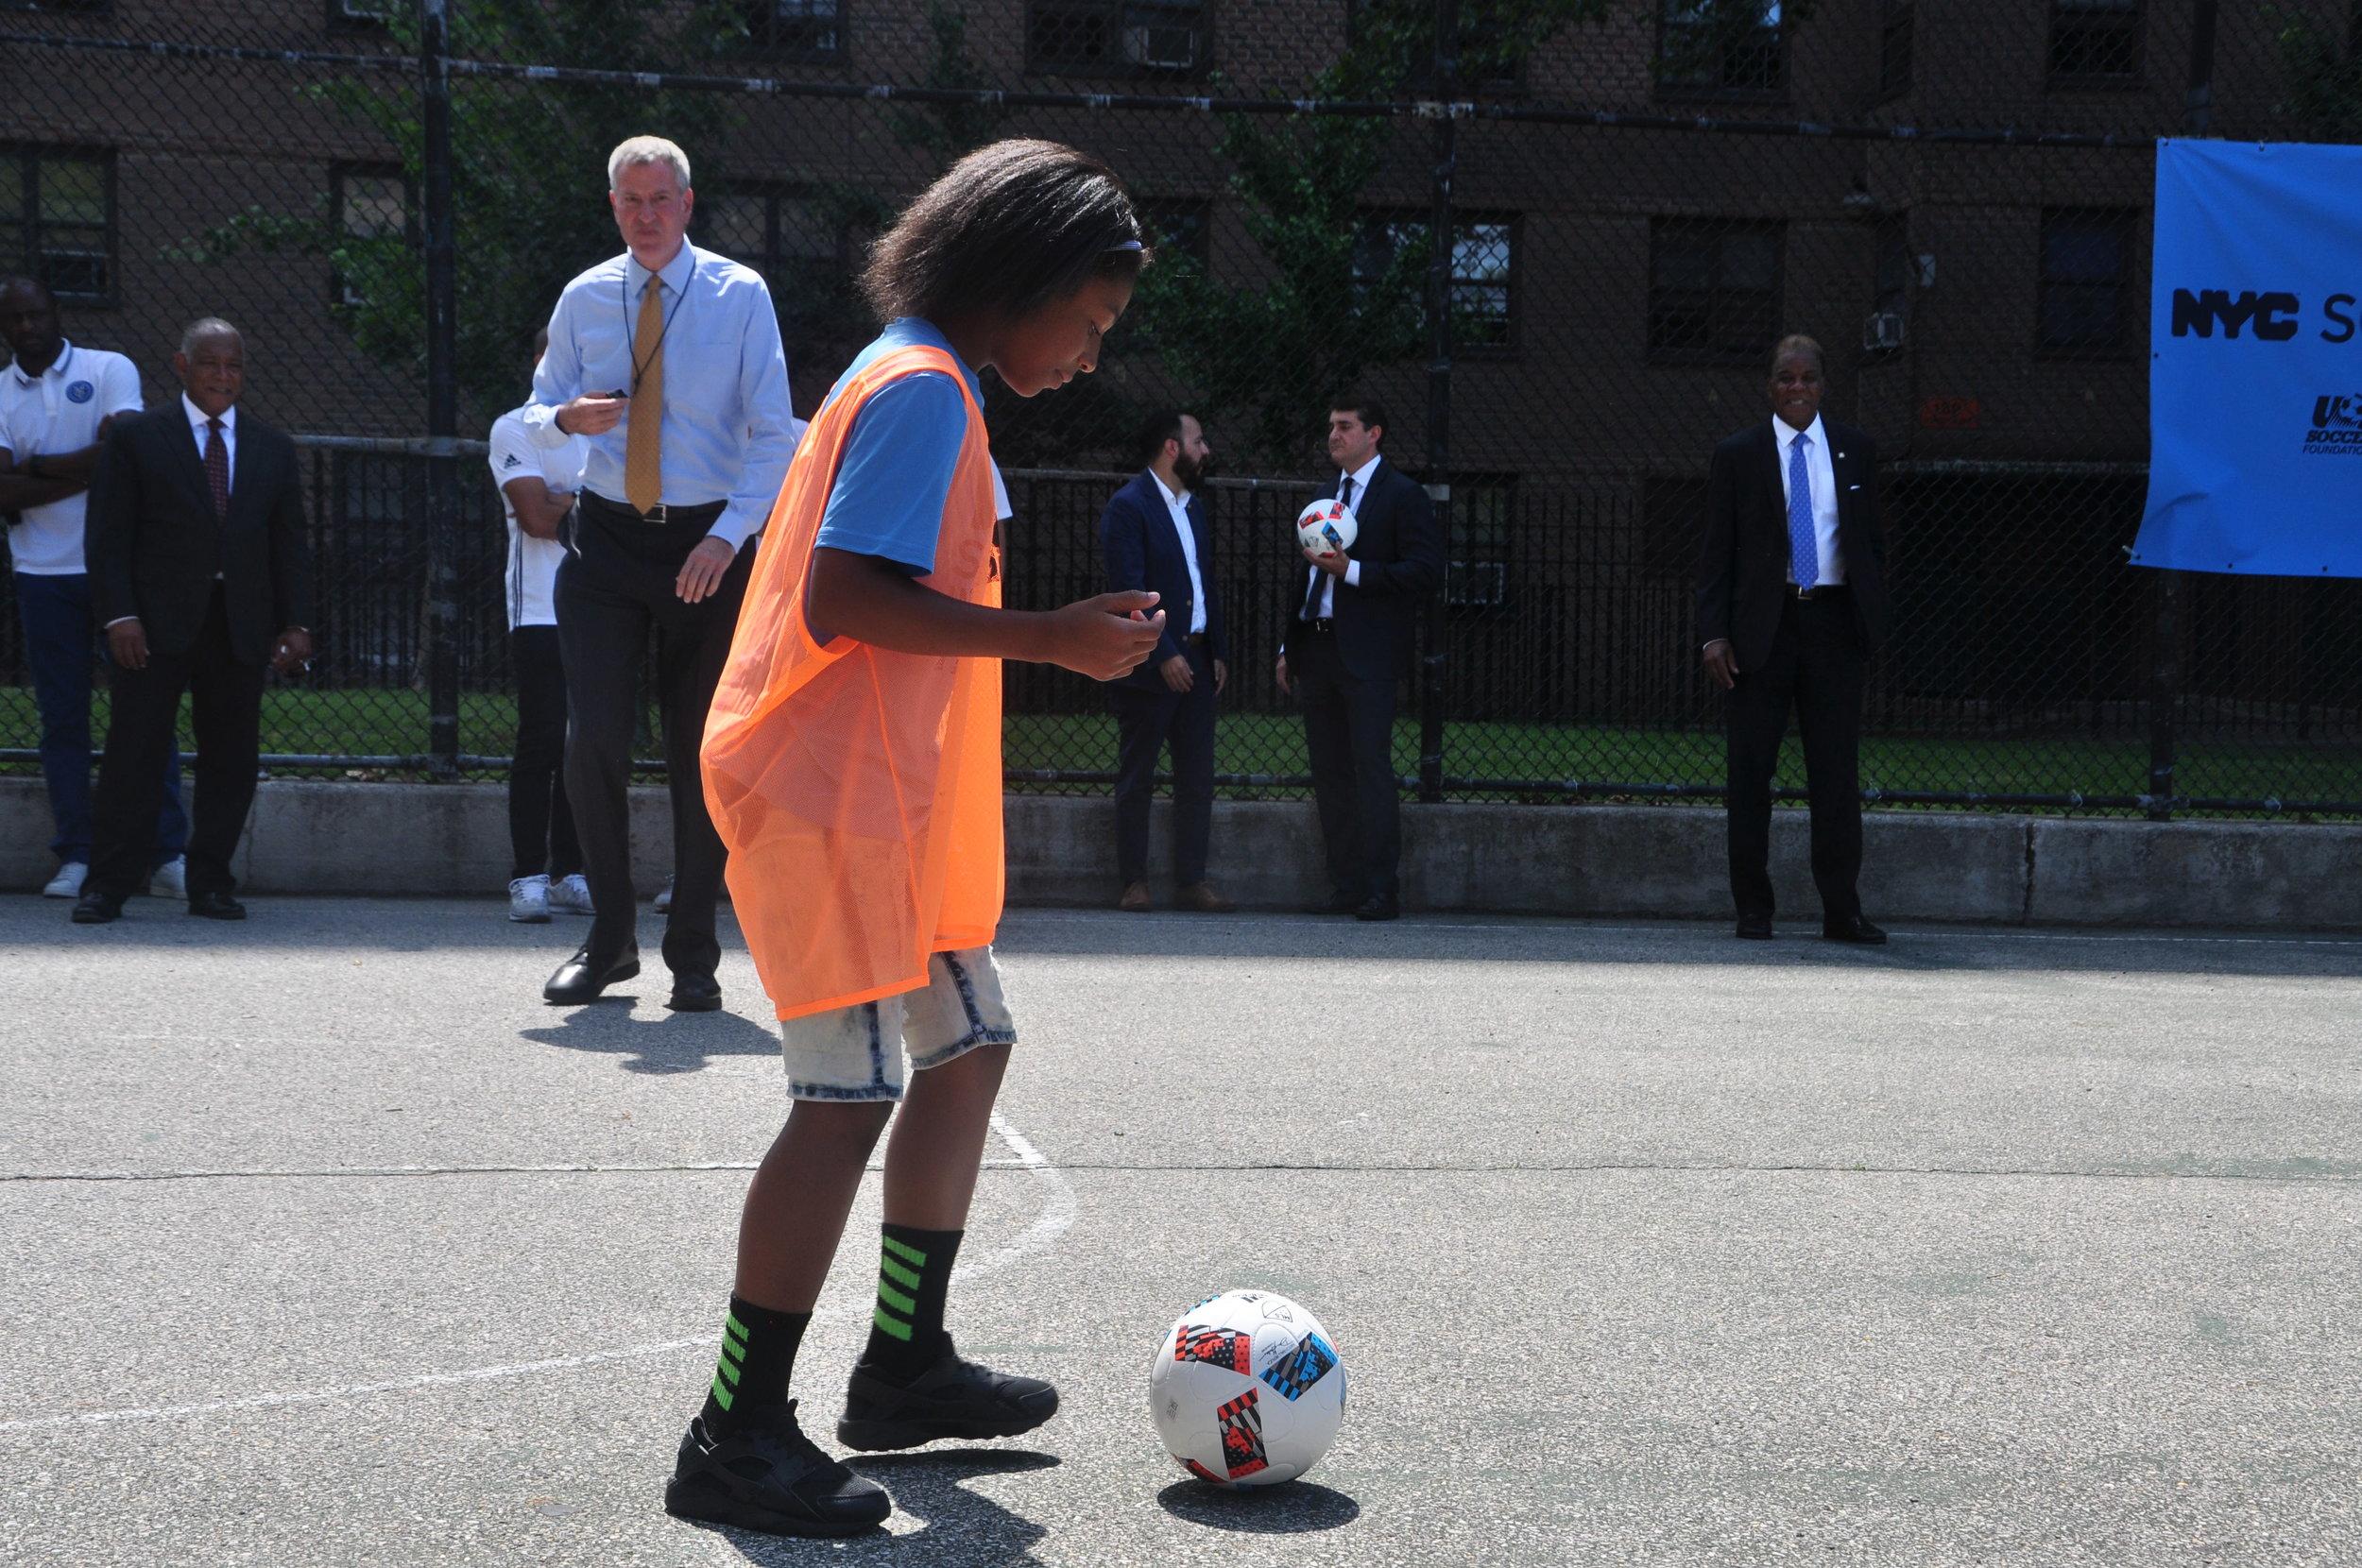 mayor and kid 5.JPG